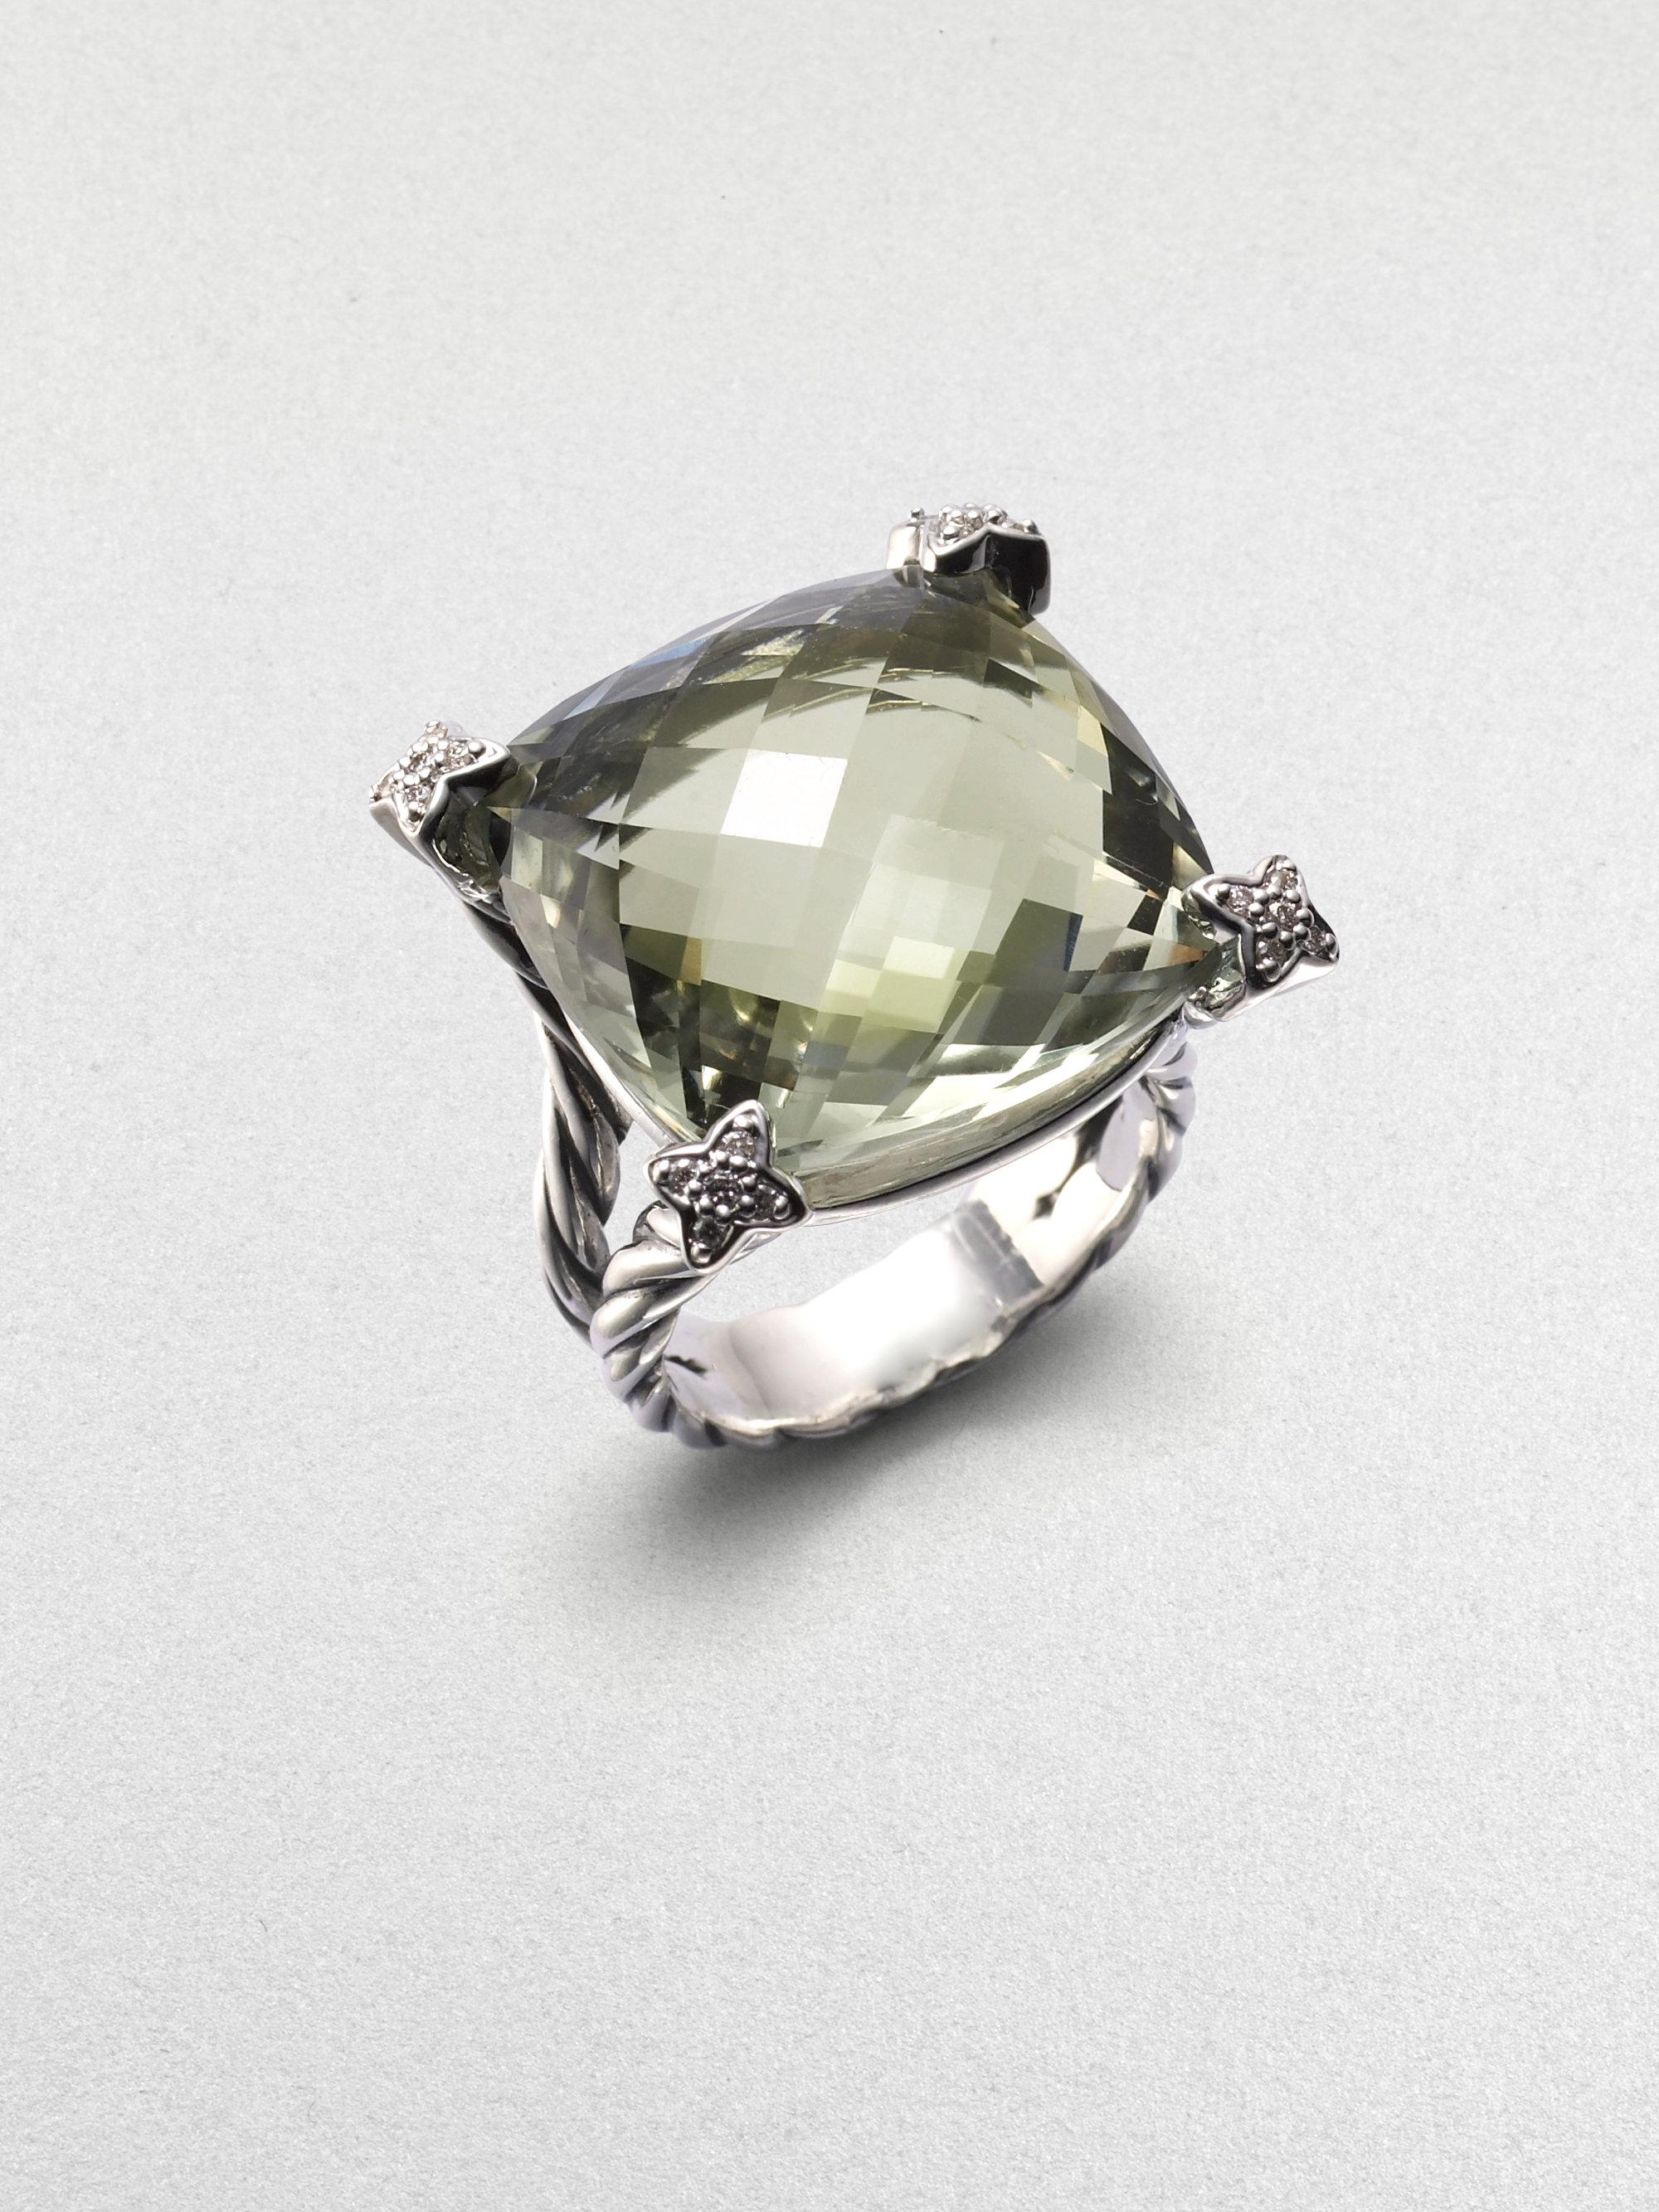 david yurman prasiolite sterling silver ring in